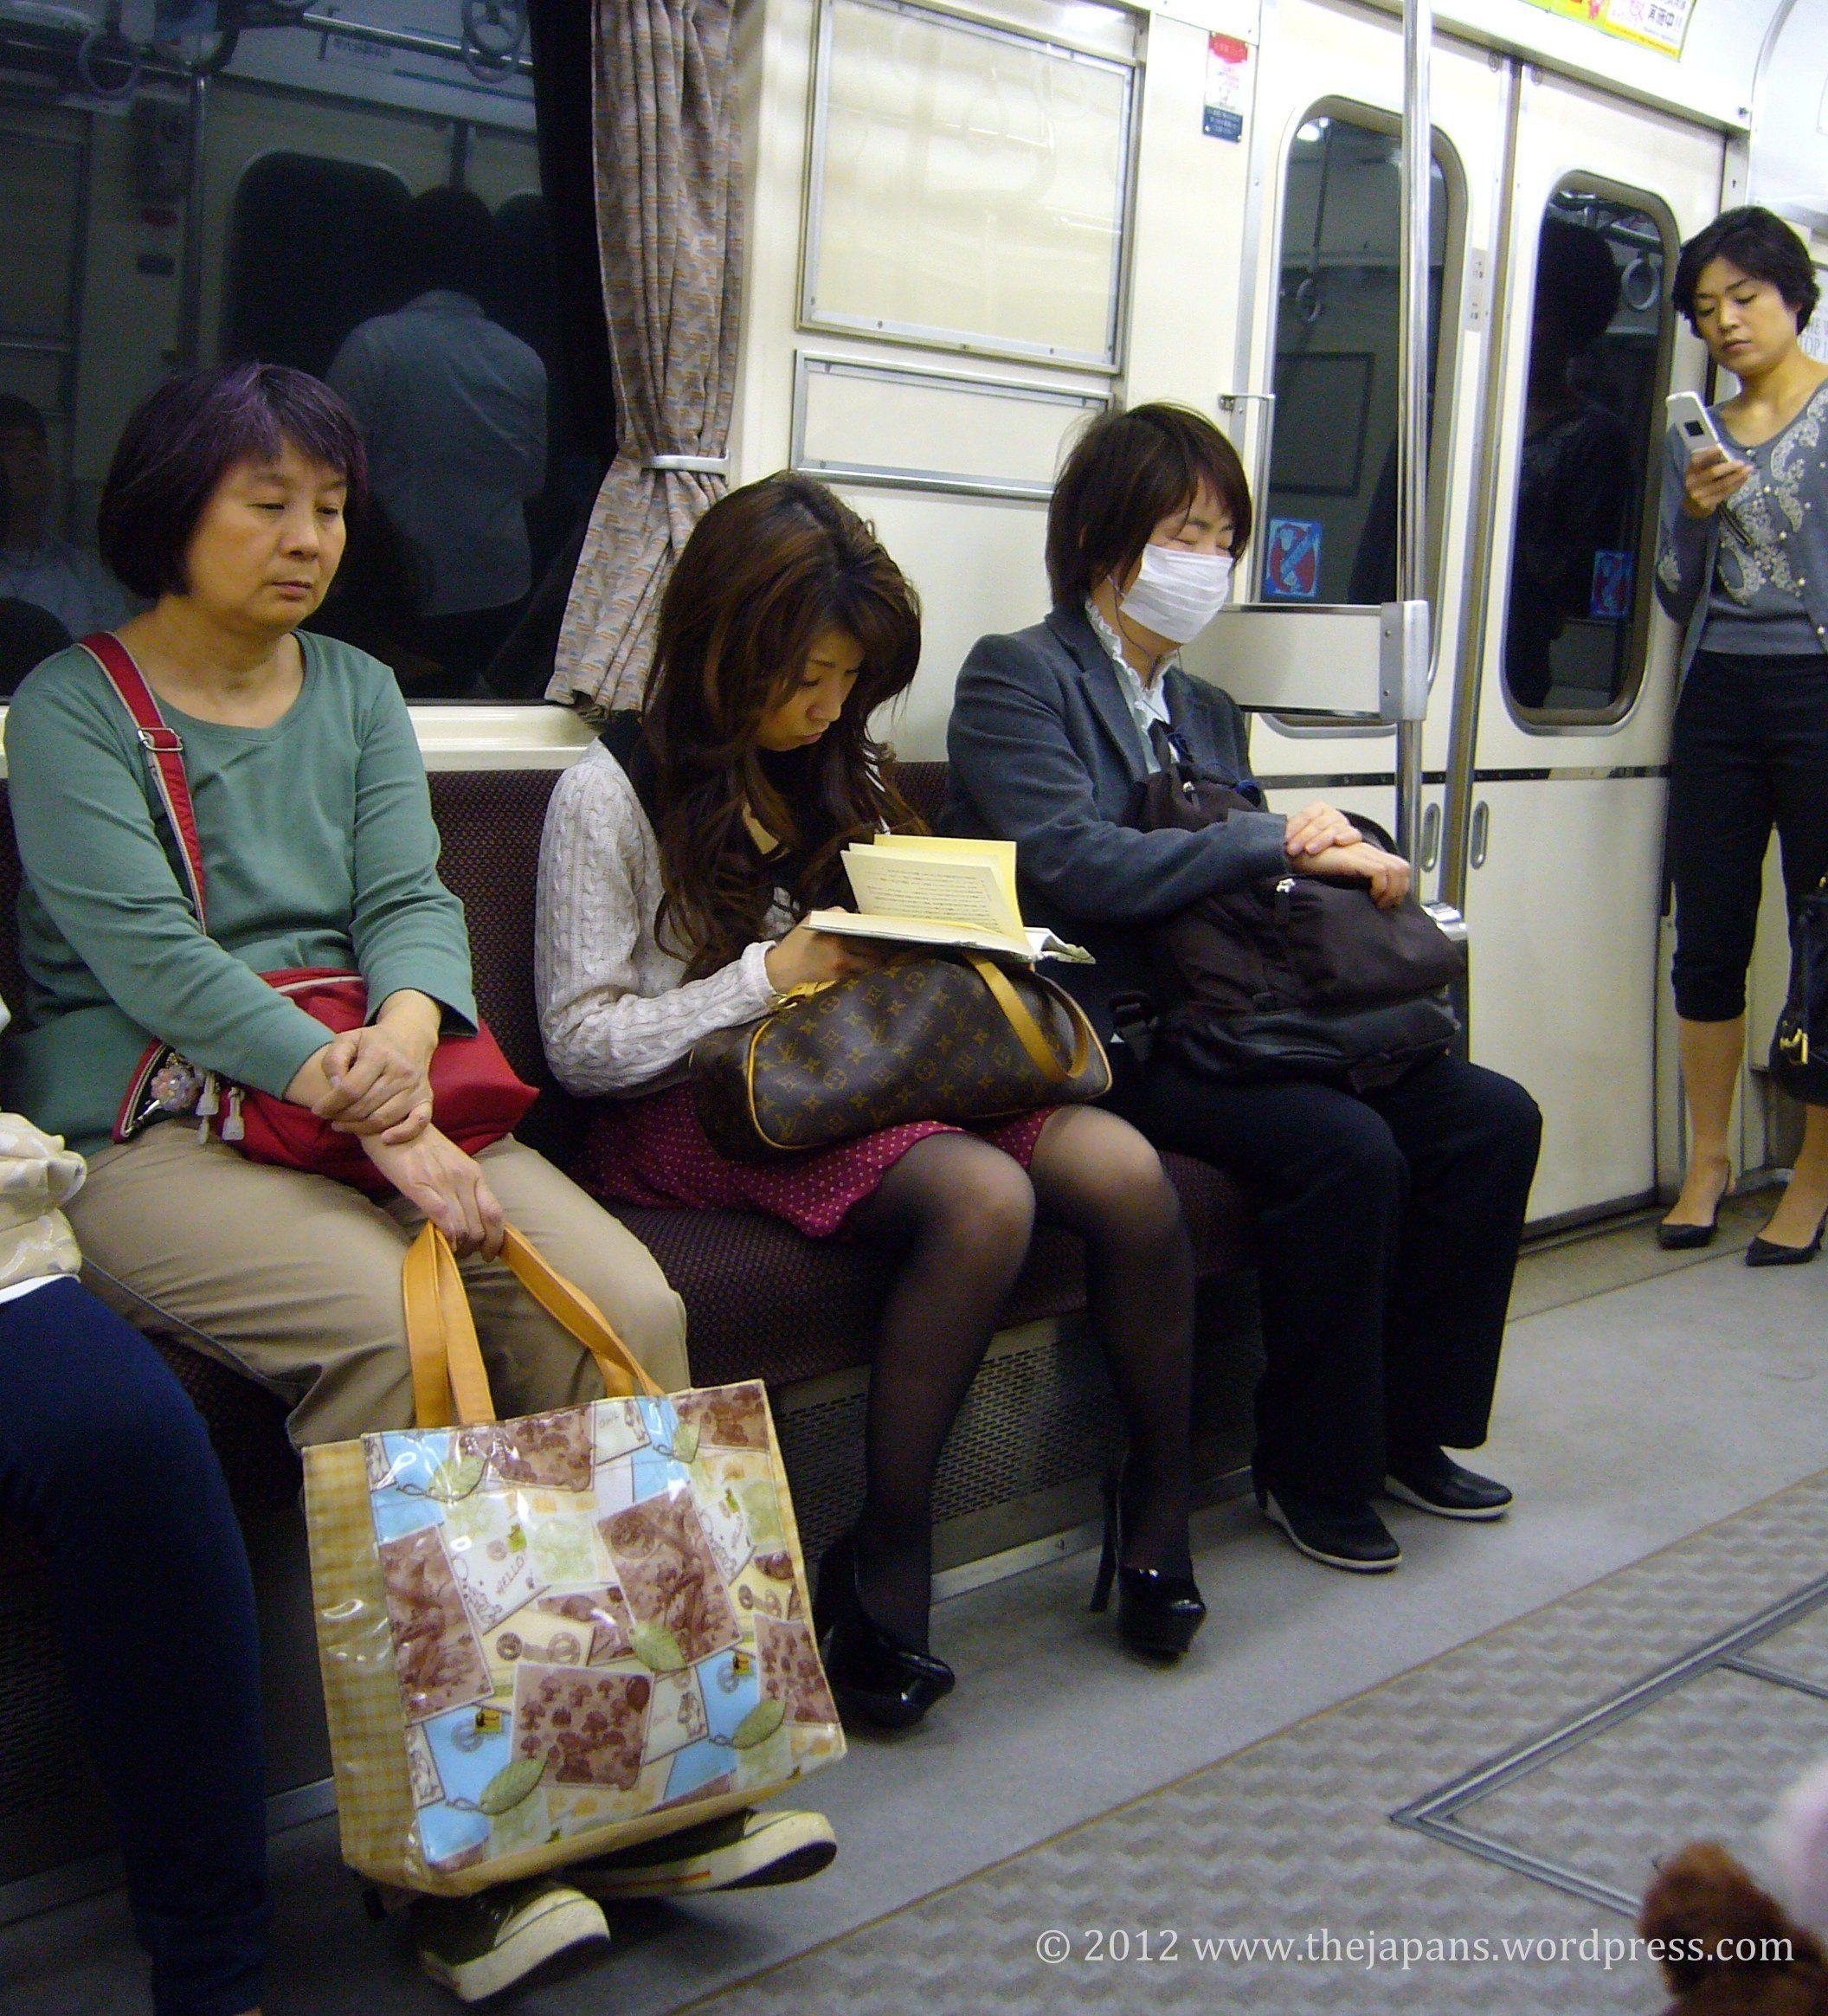 Japanese girls on train